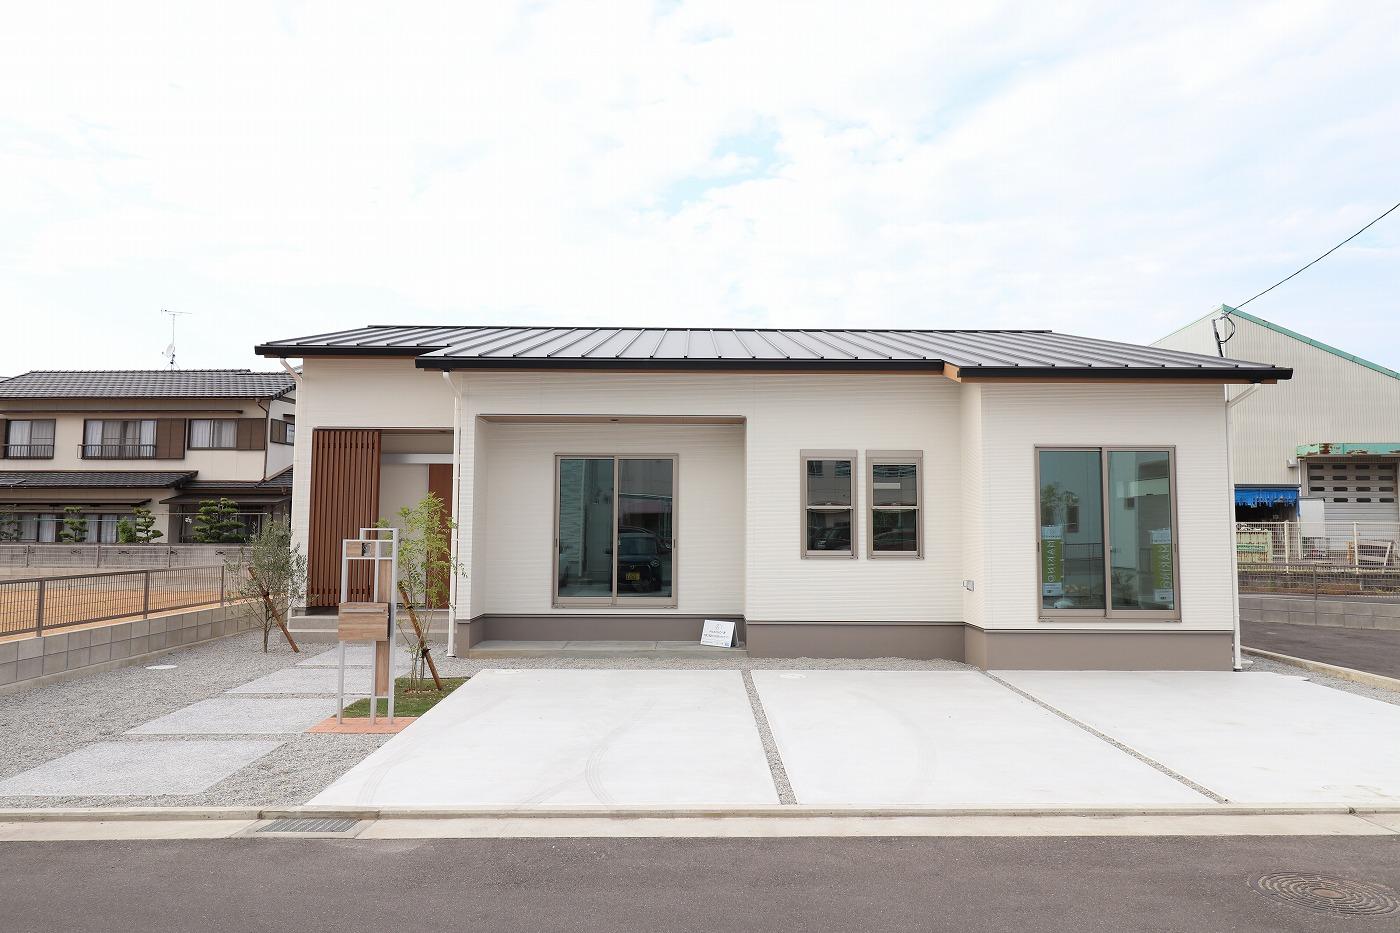 高松市下田井町の新築分譲住宅の外観